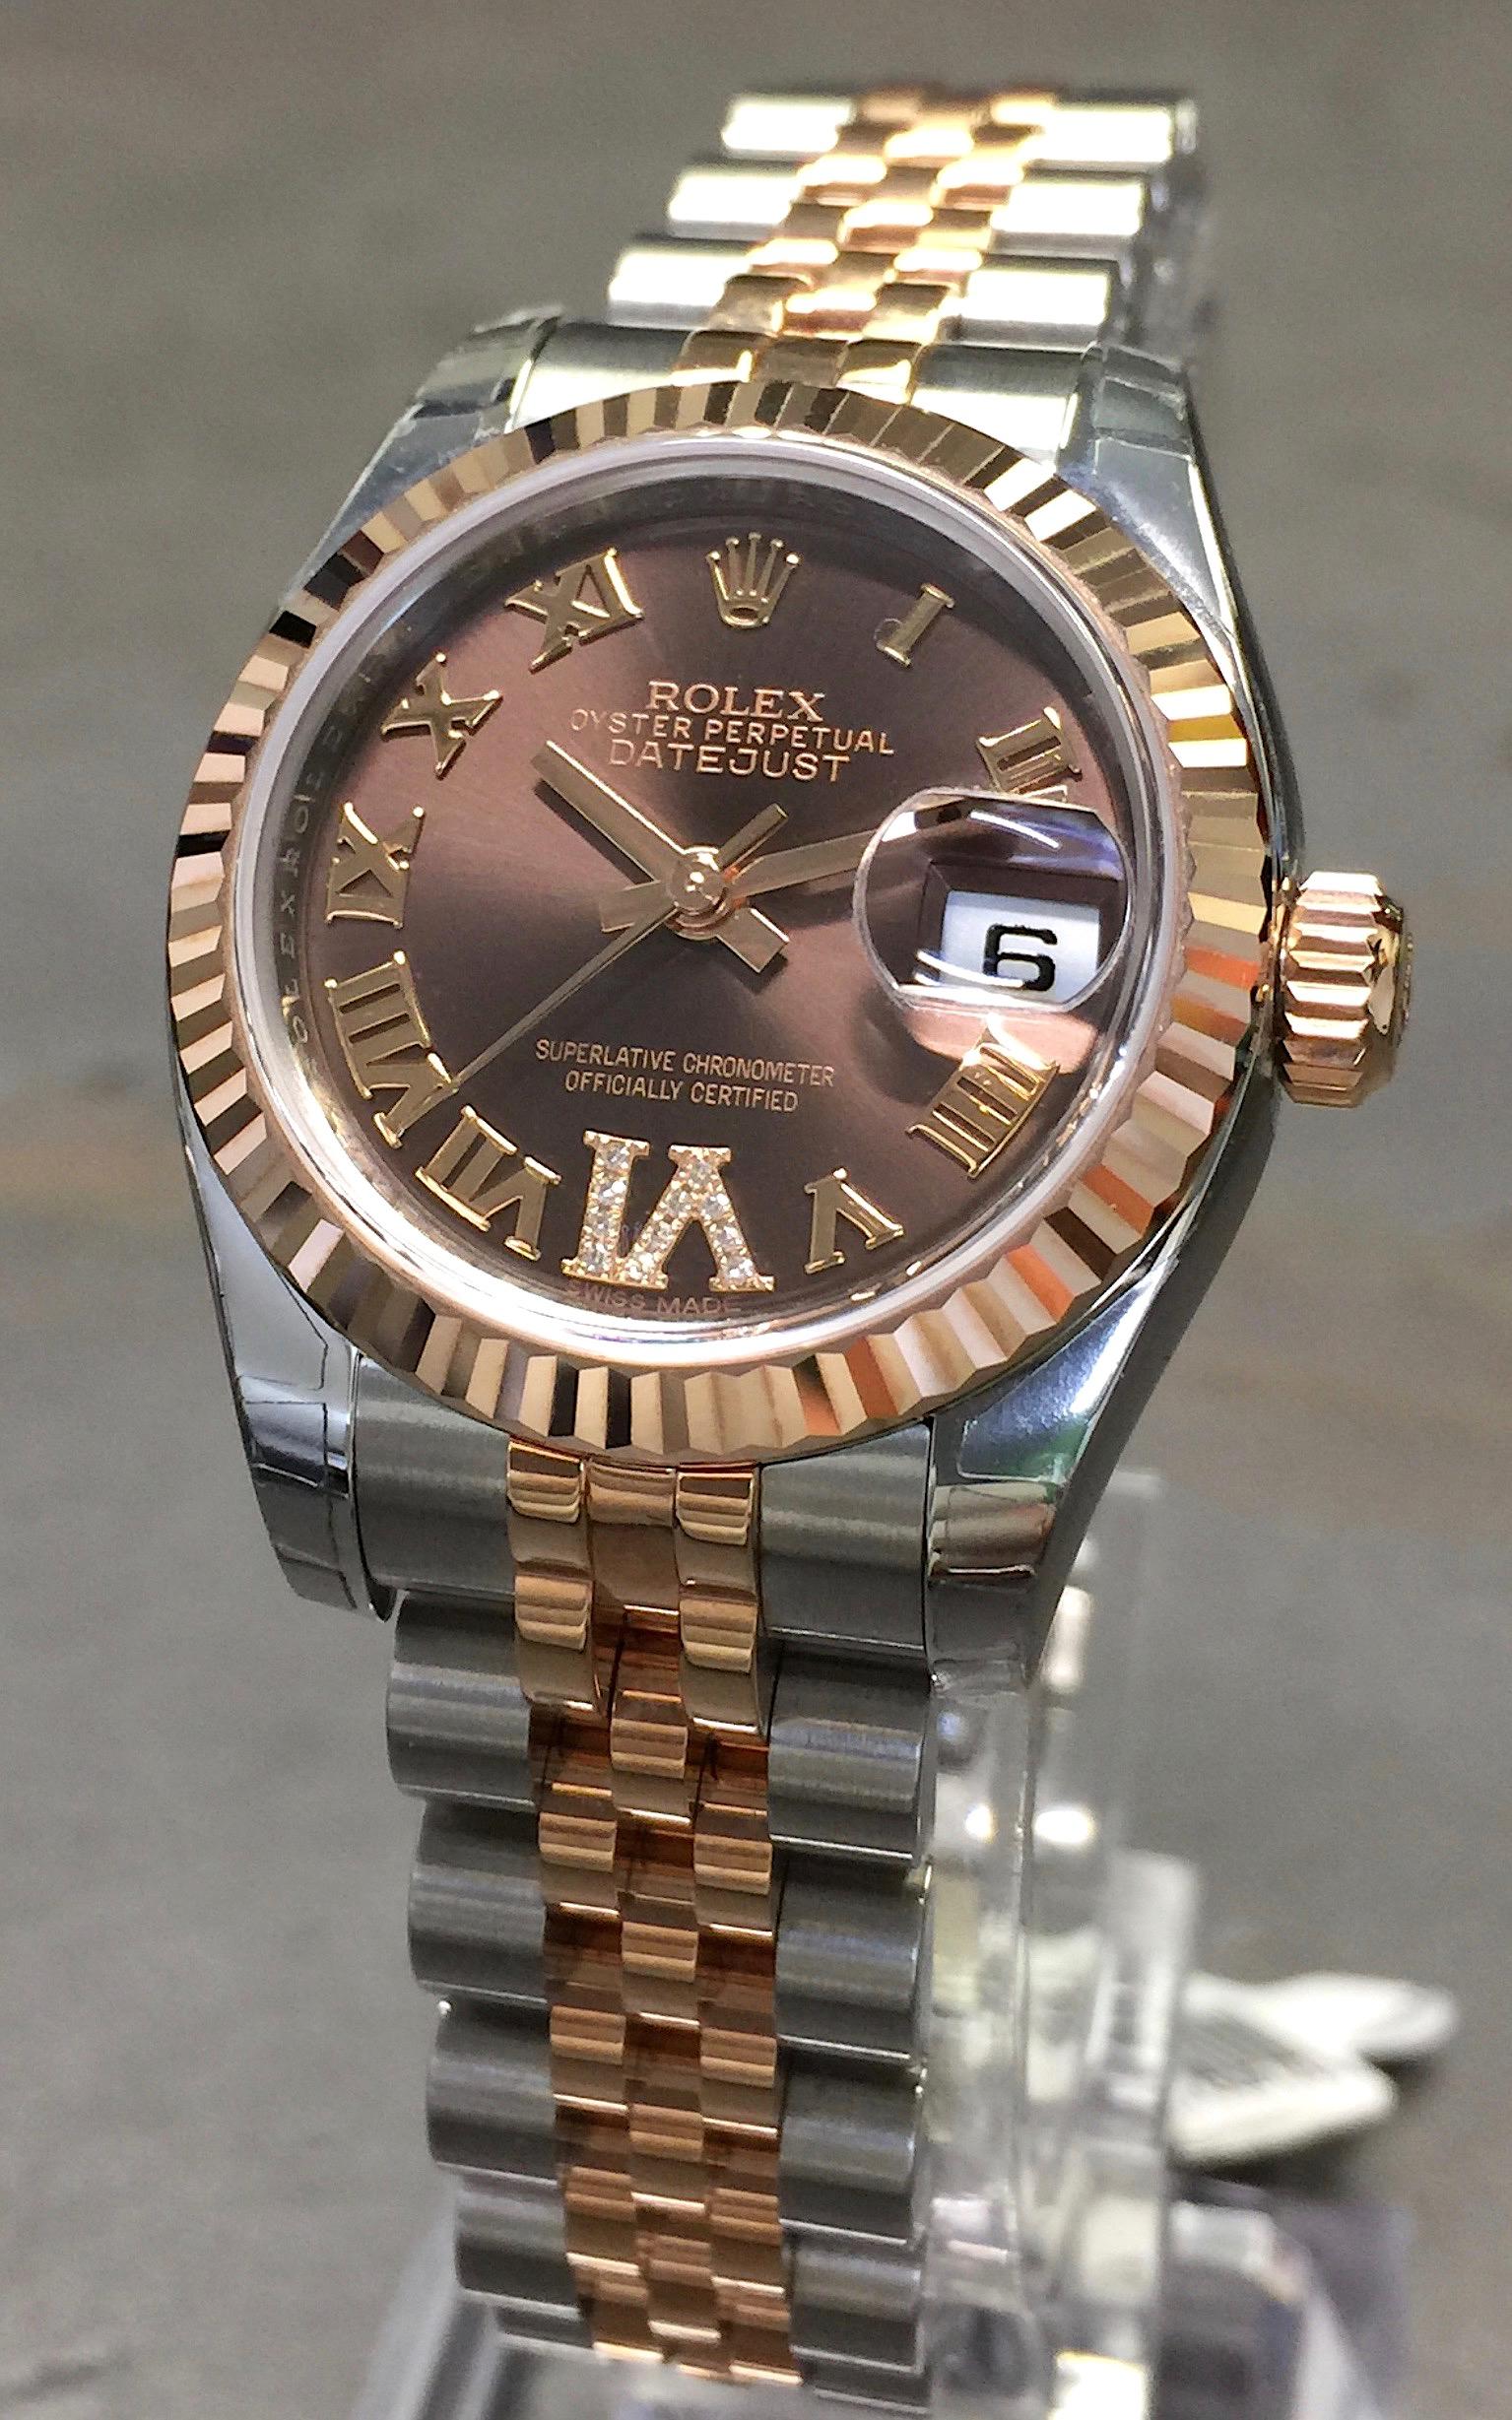 New 2017 Rolex Datejust 26mm 179171 18k Rose Gold Steel